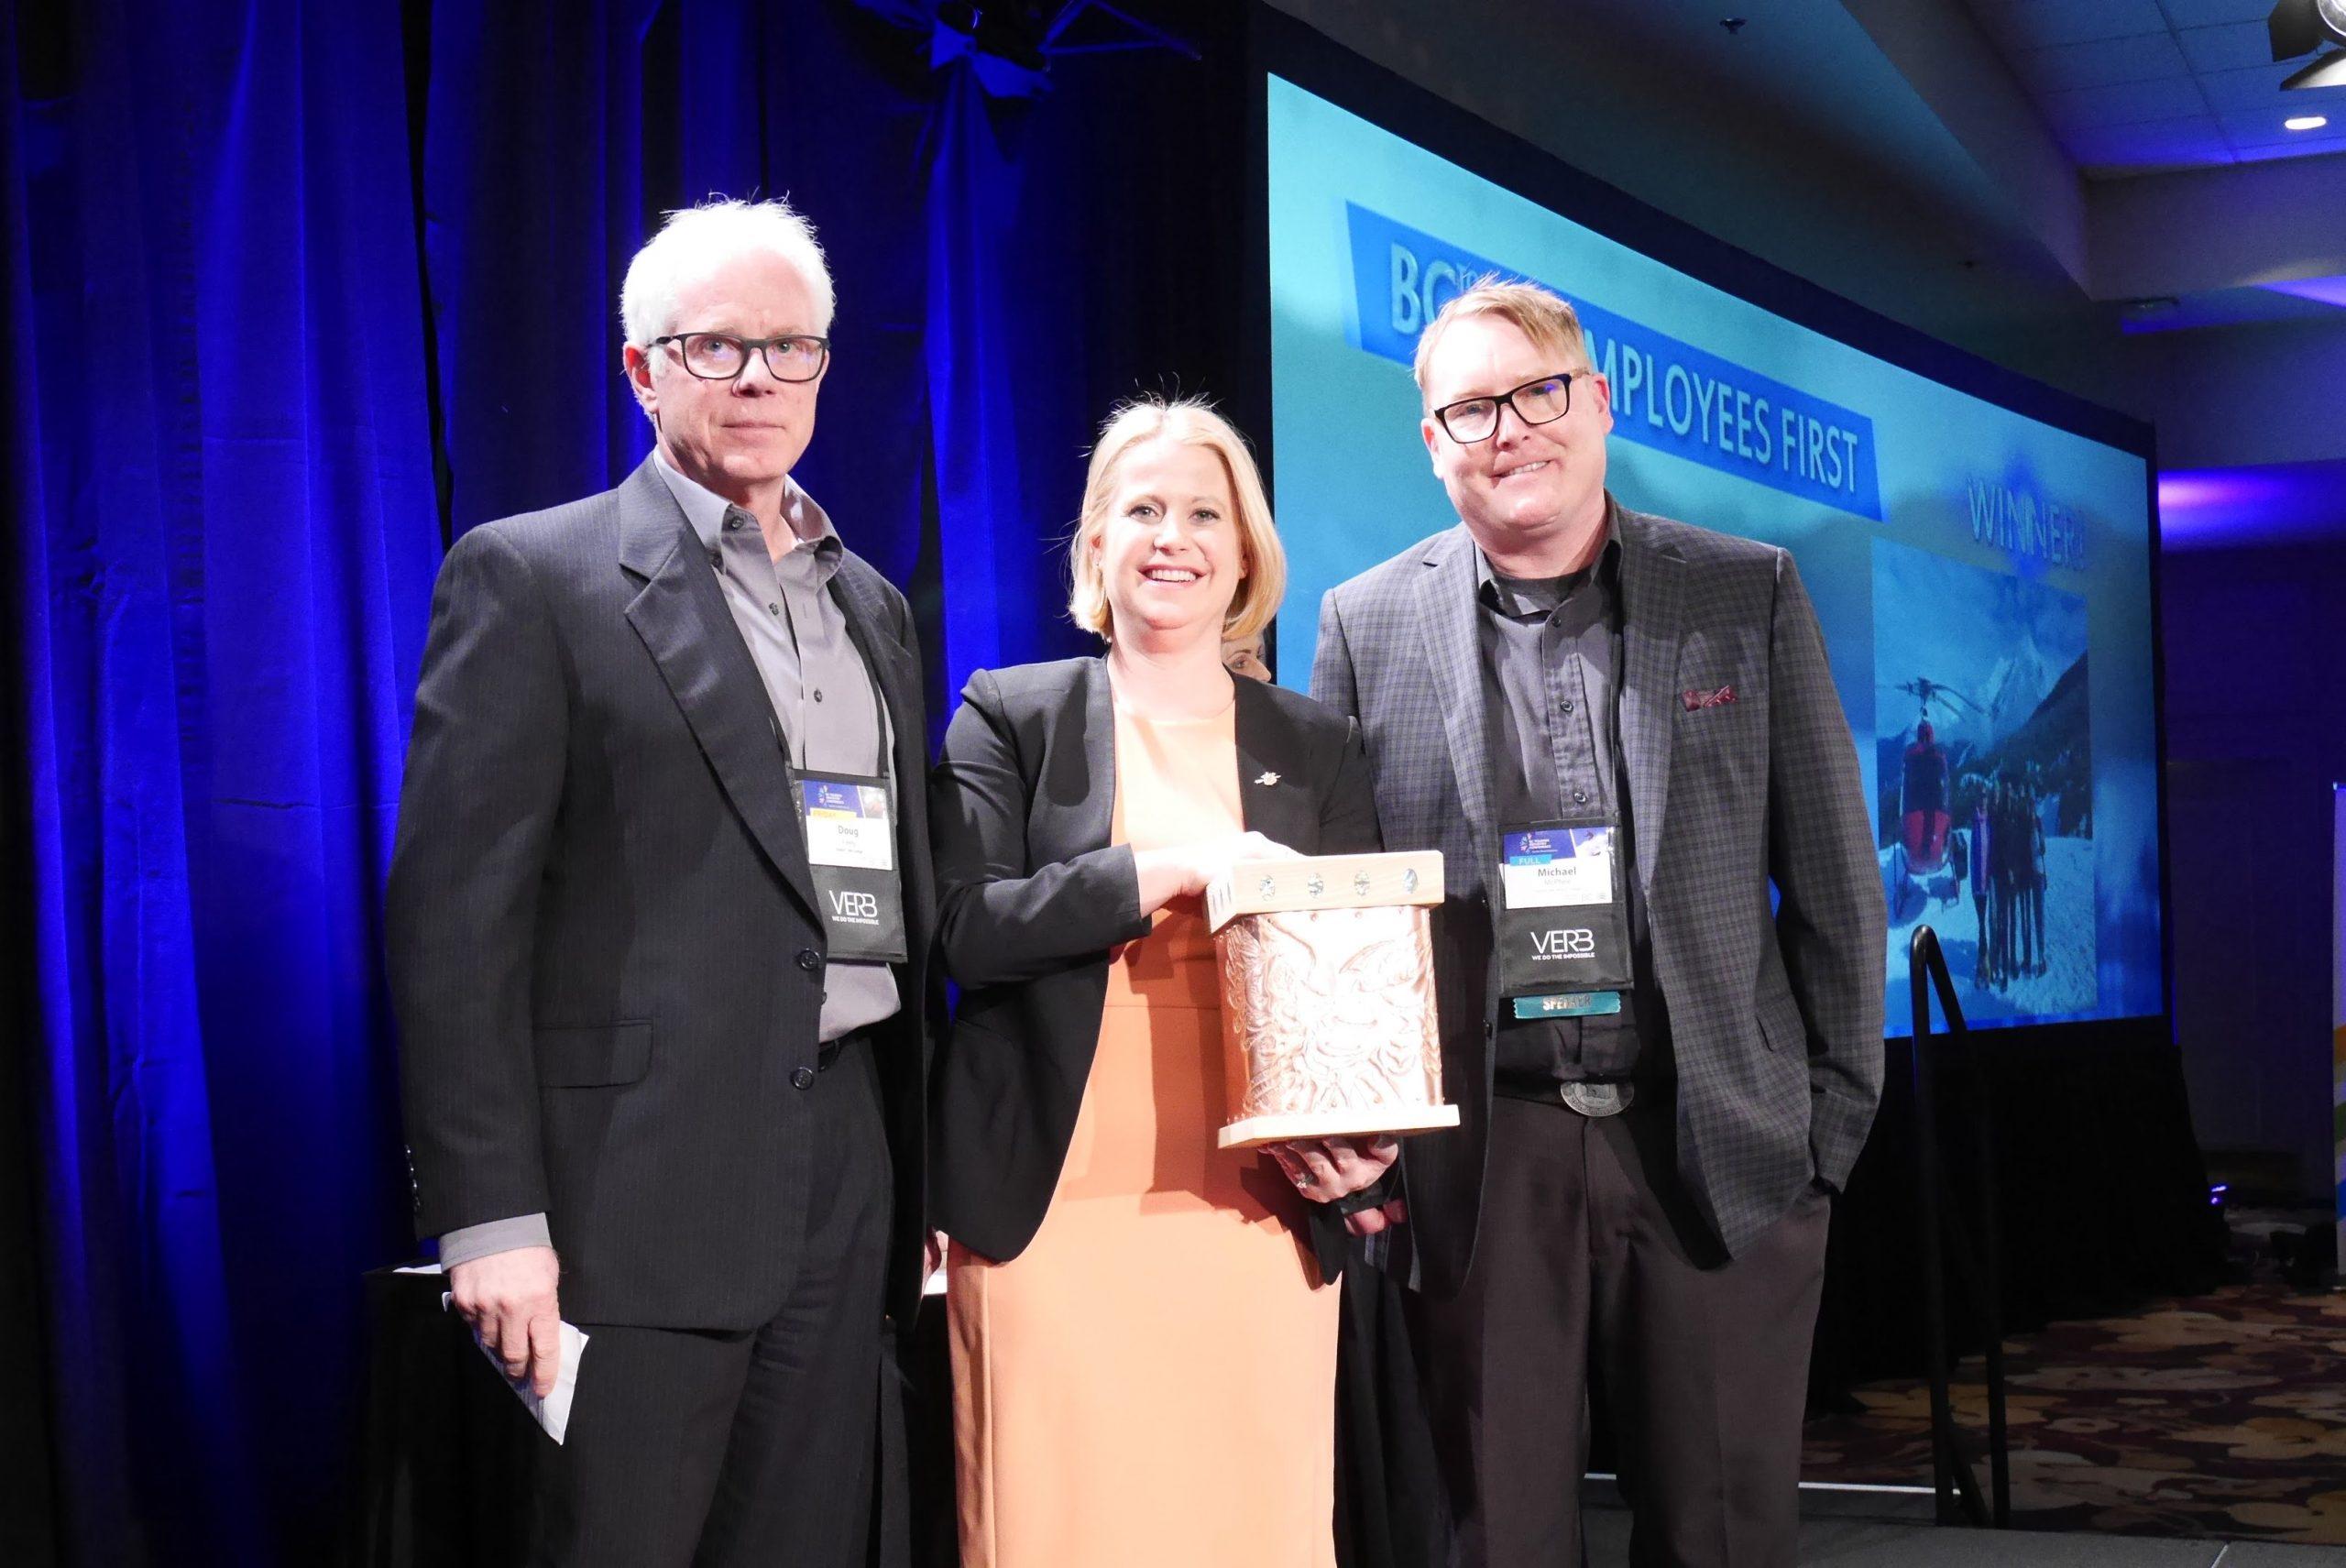 Fernie lodge wins 2018 Employees First Award